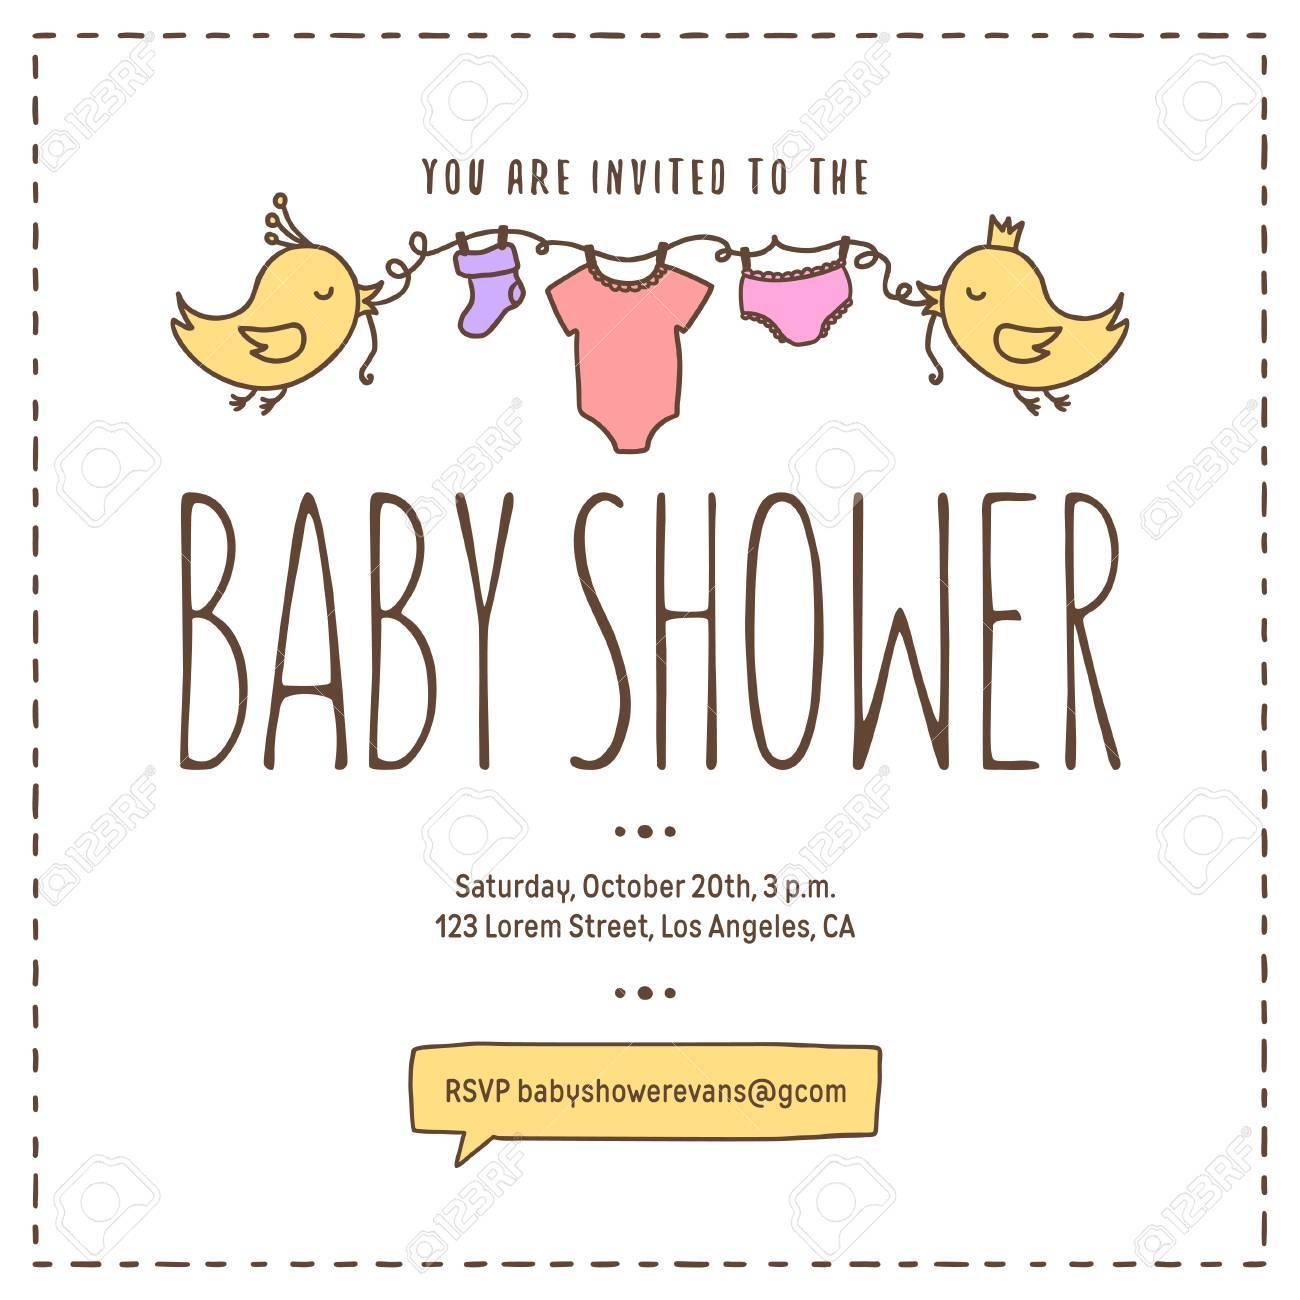 baby shower invitation template cartoon style birds holding